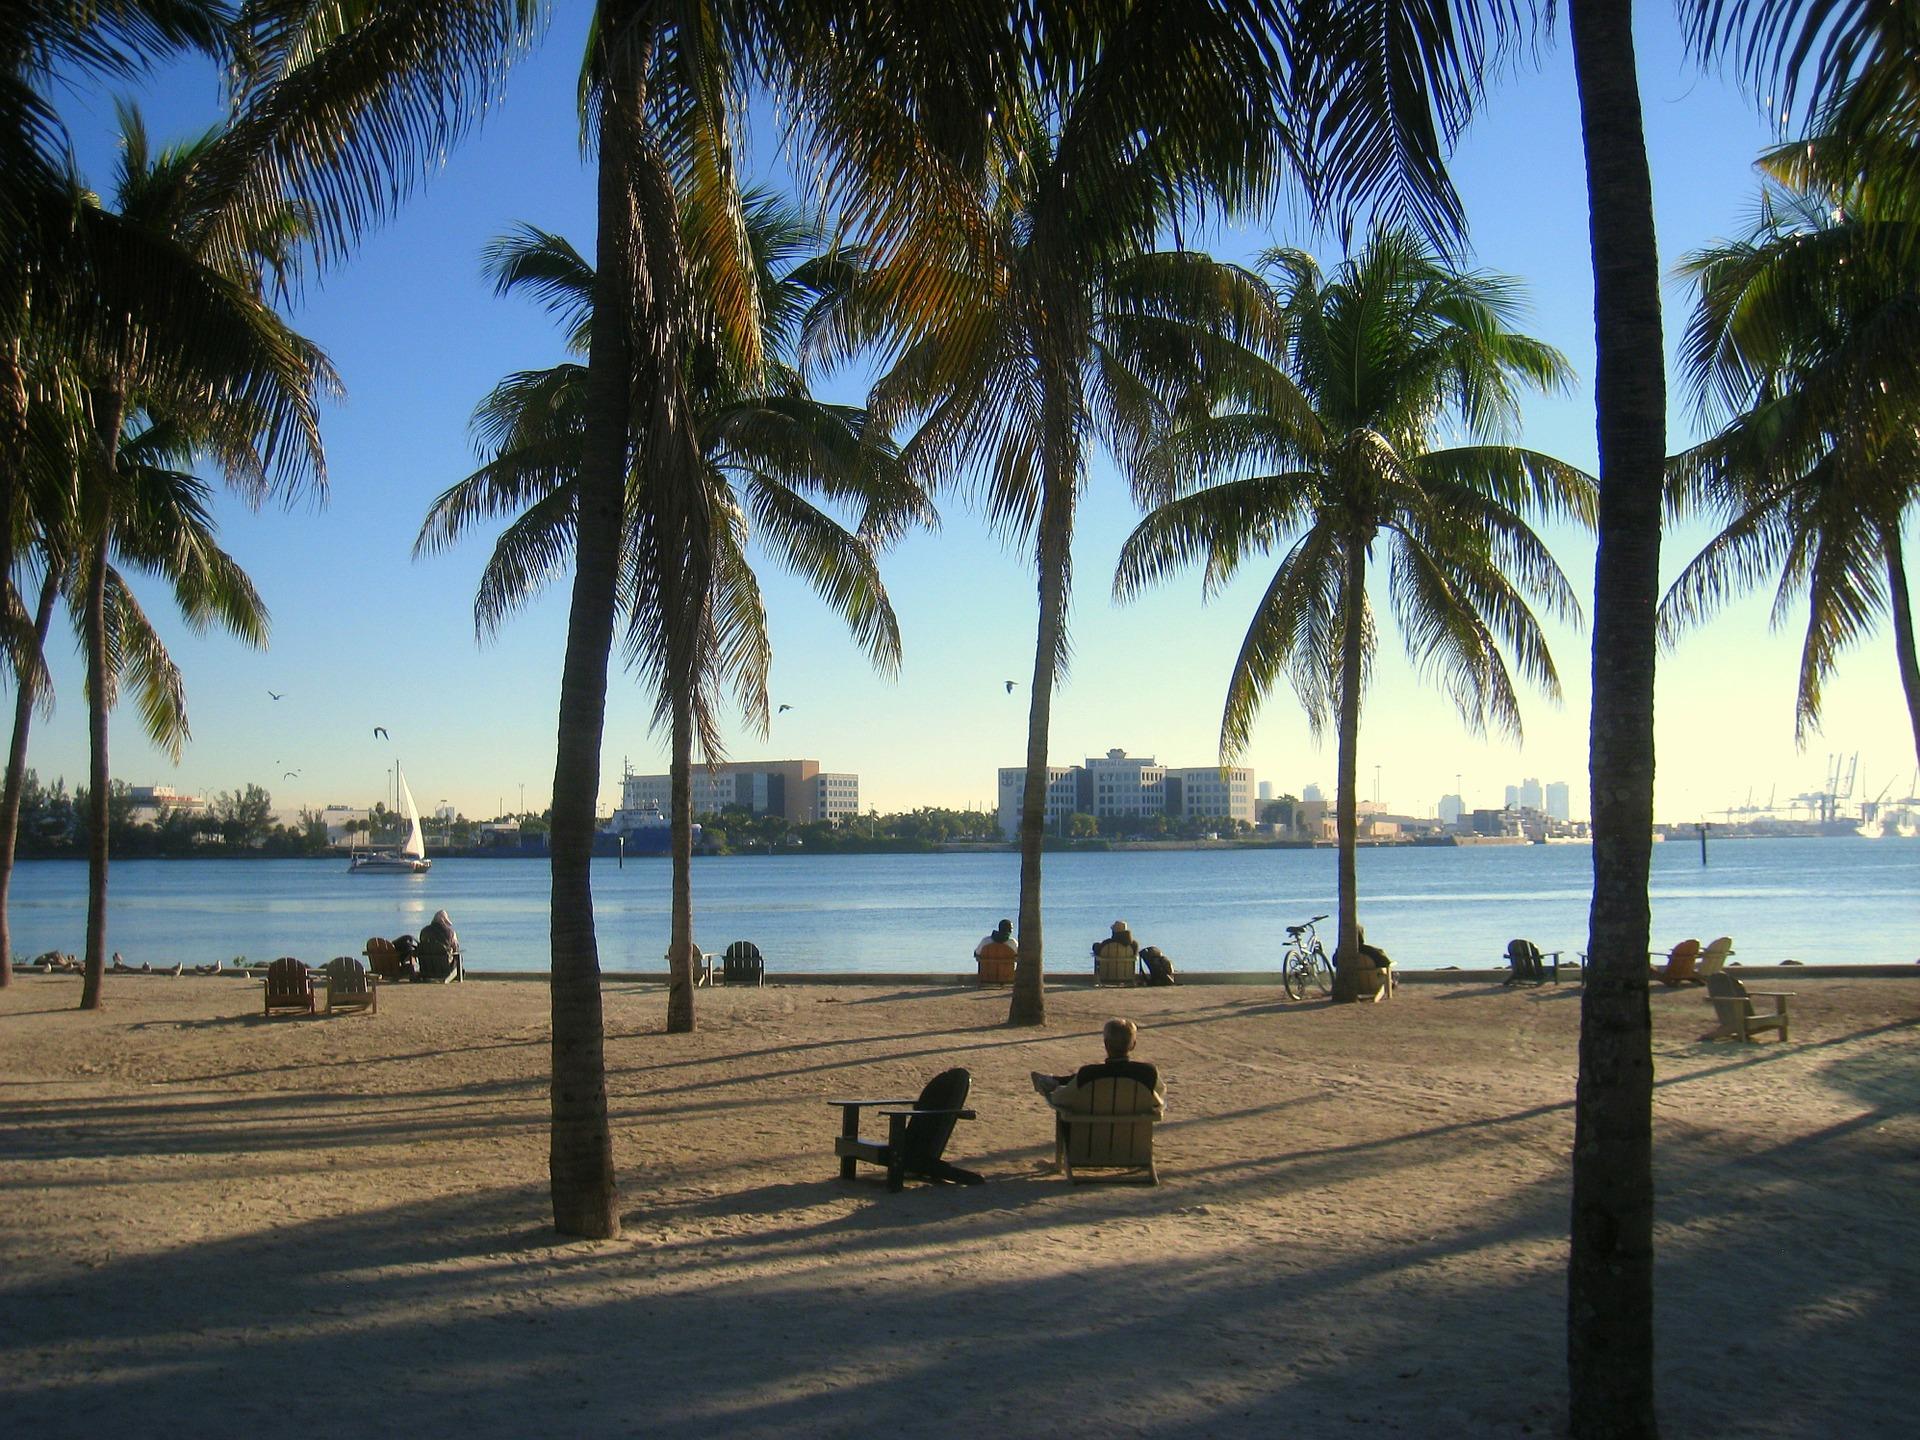 Florida USA: spoiled by the sun / Pixabay